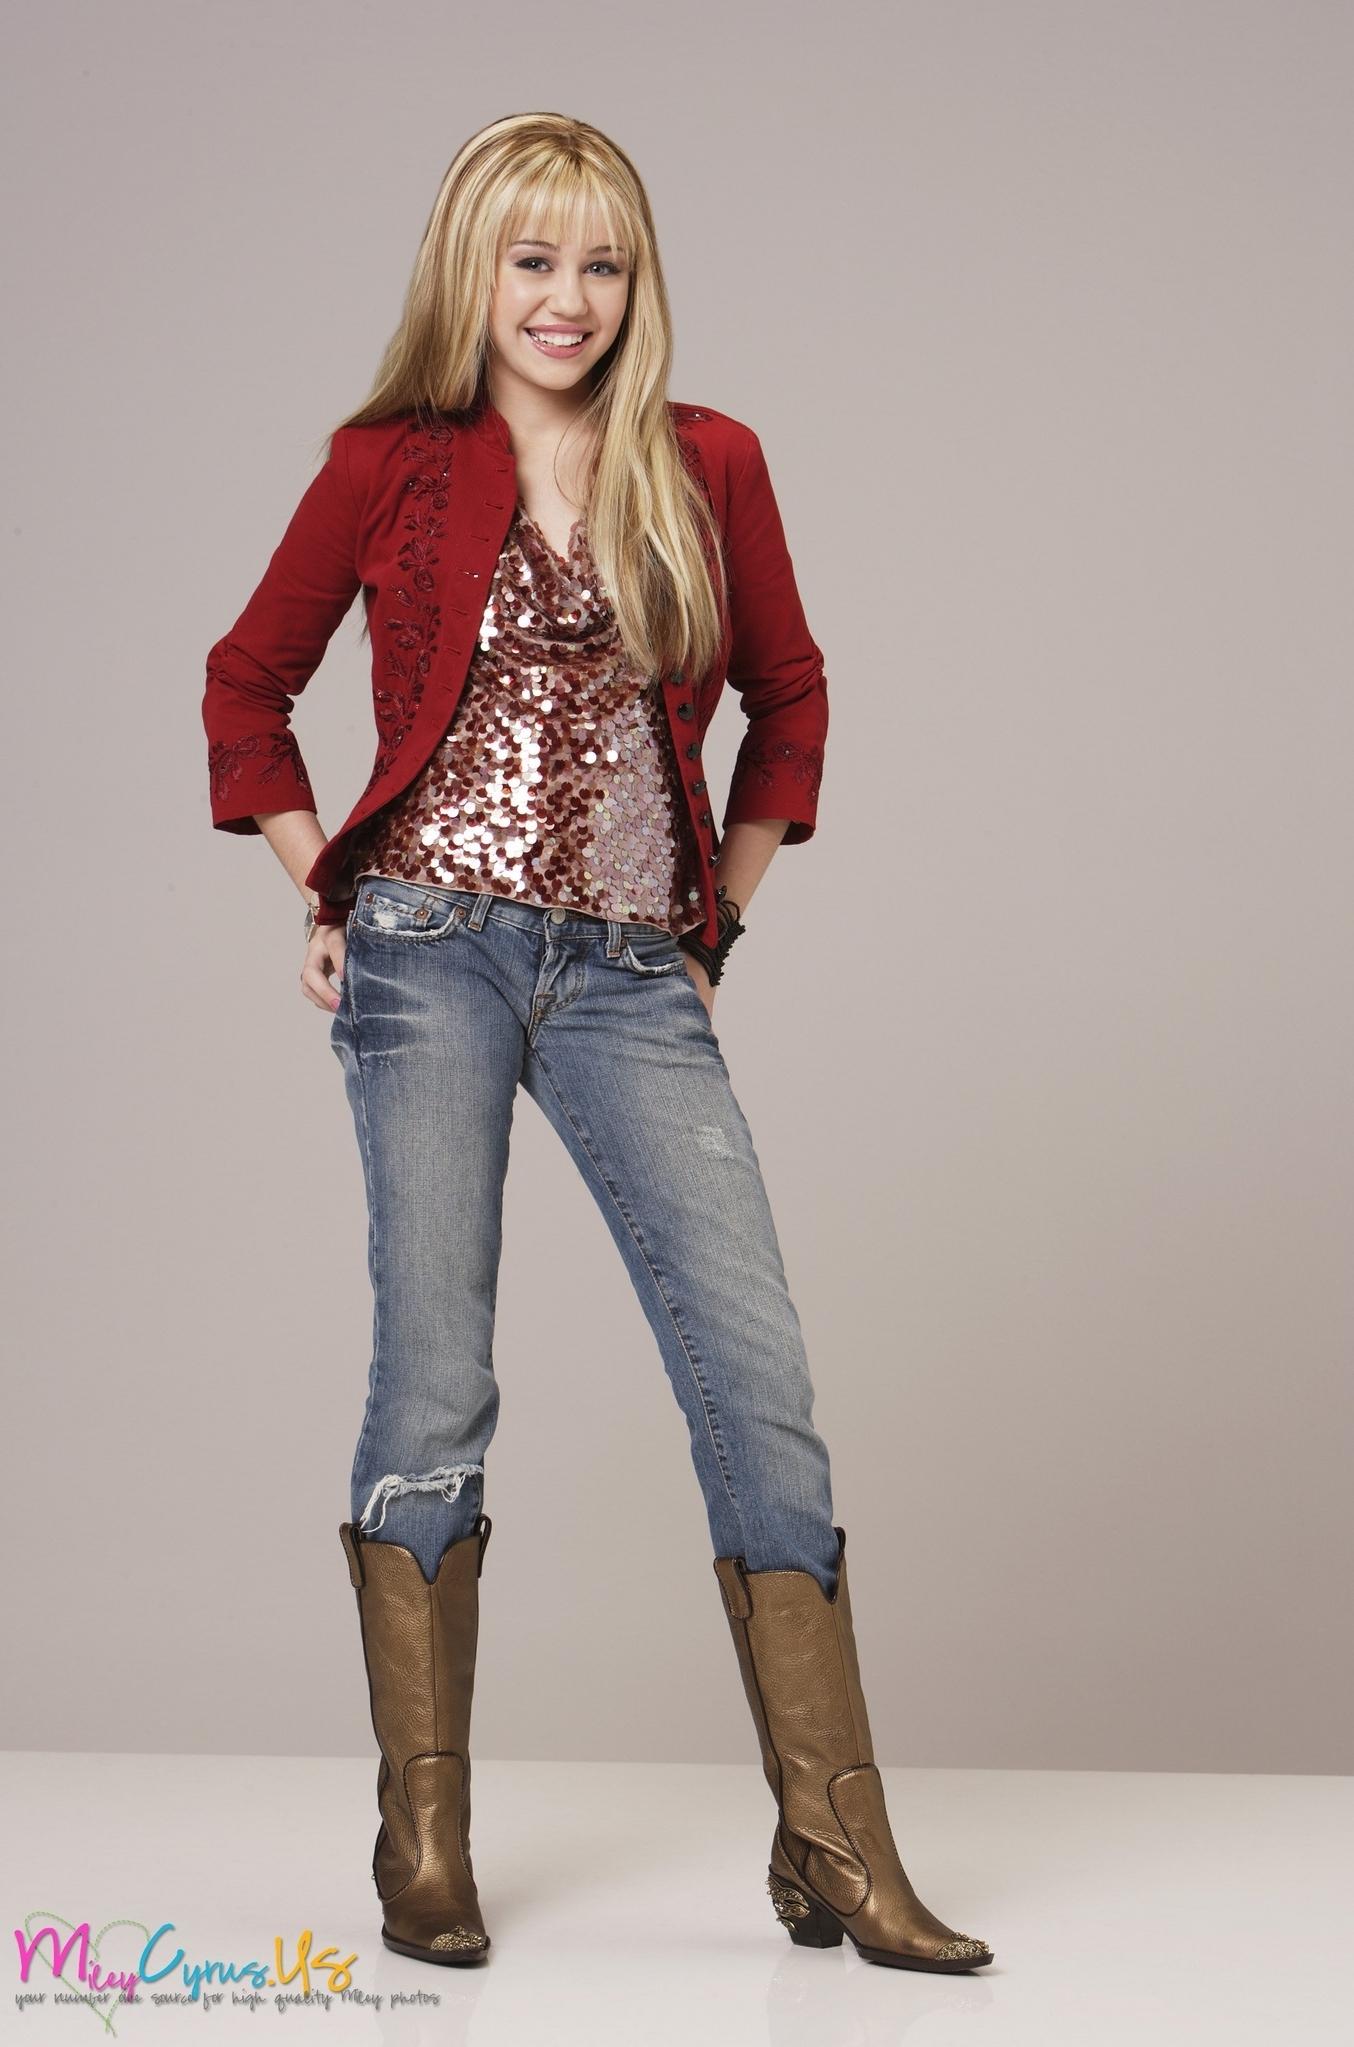 Hannah Montana Season 1 Promotional चित्रो [HQ] <3